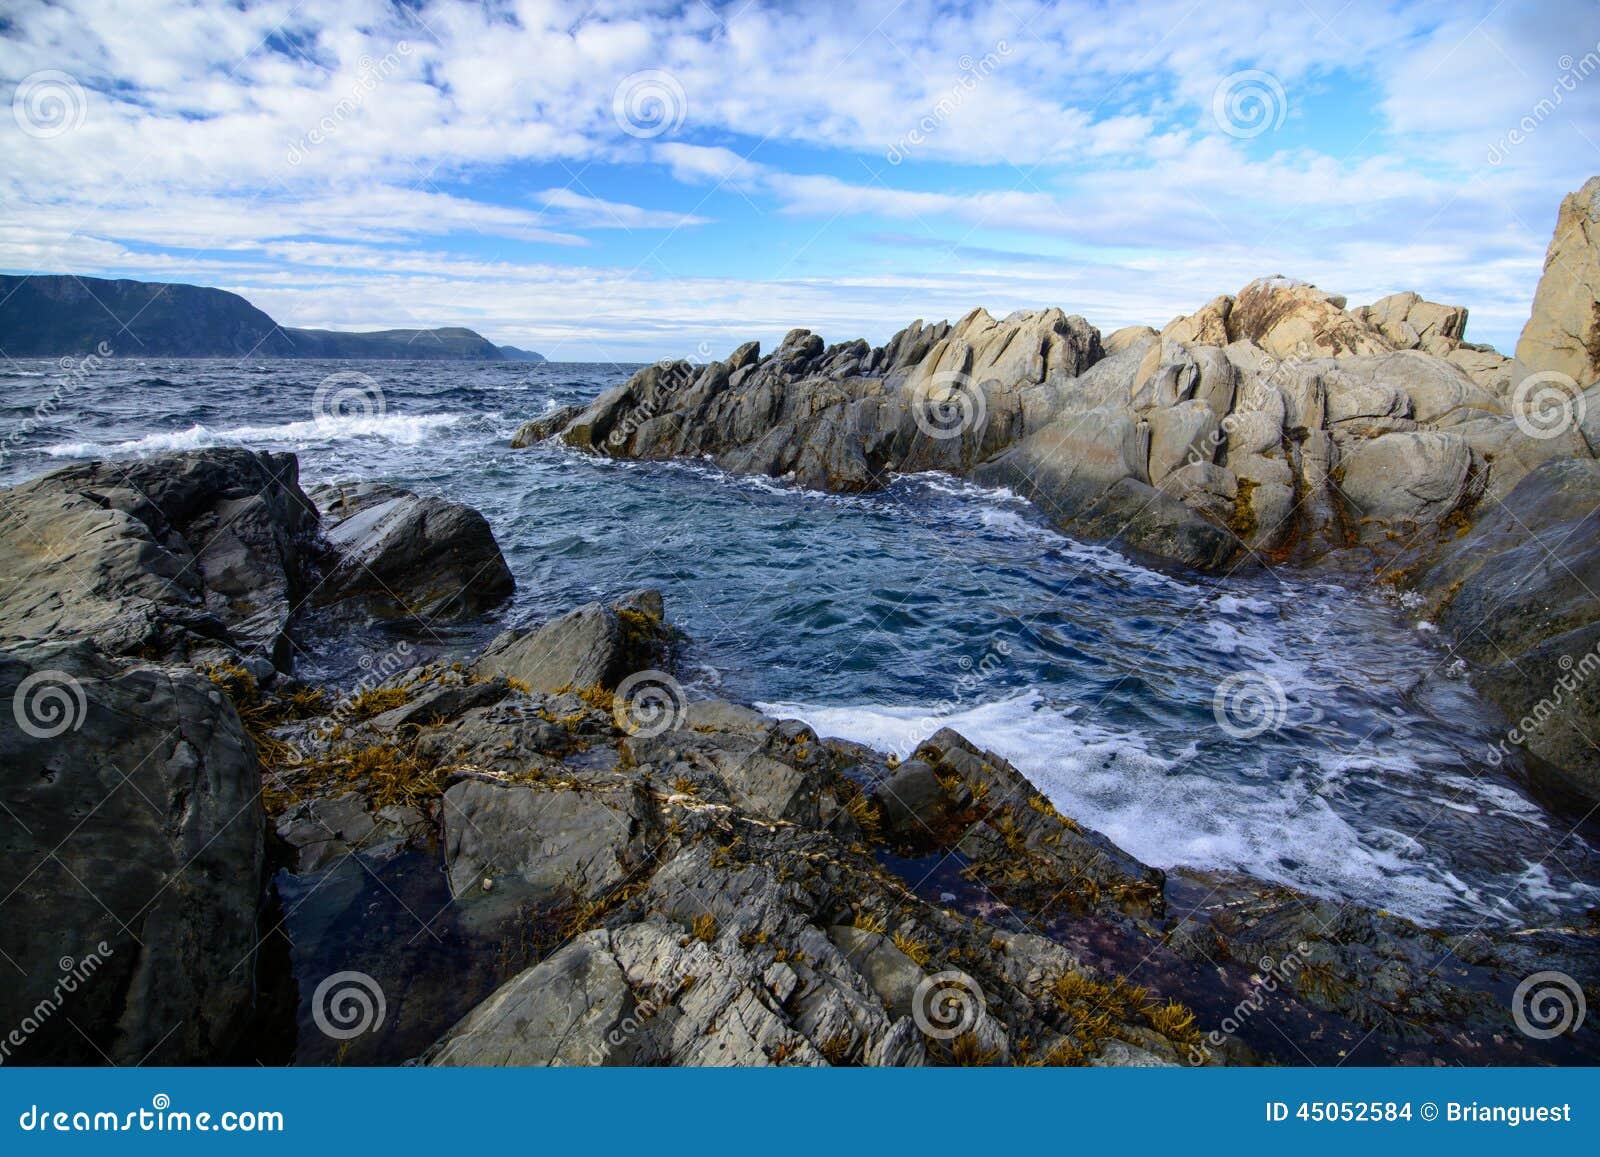 Bay Shore Web Design